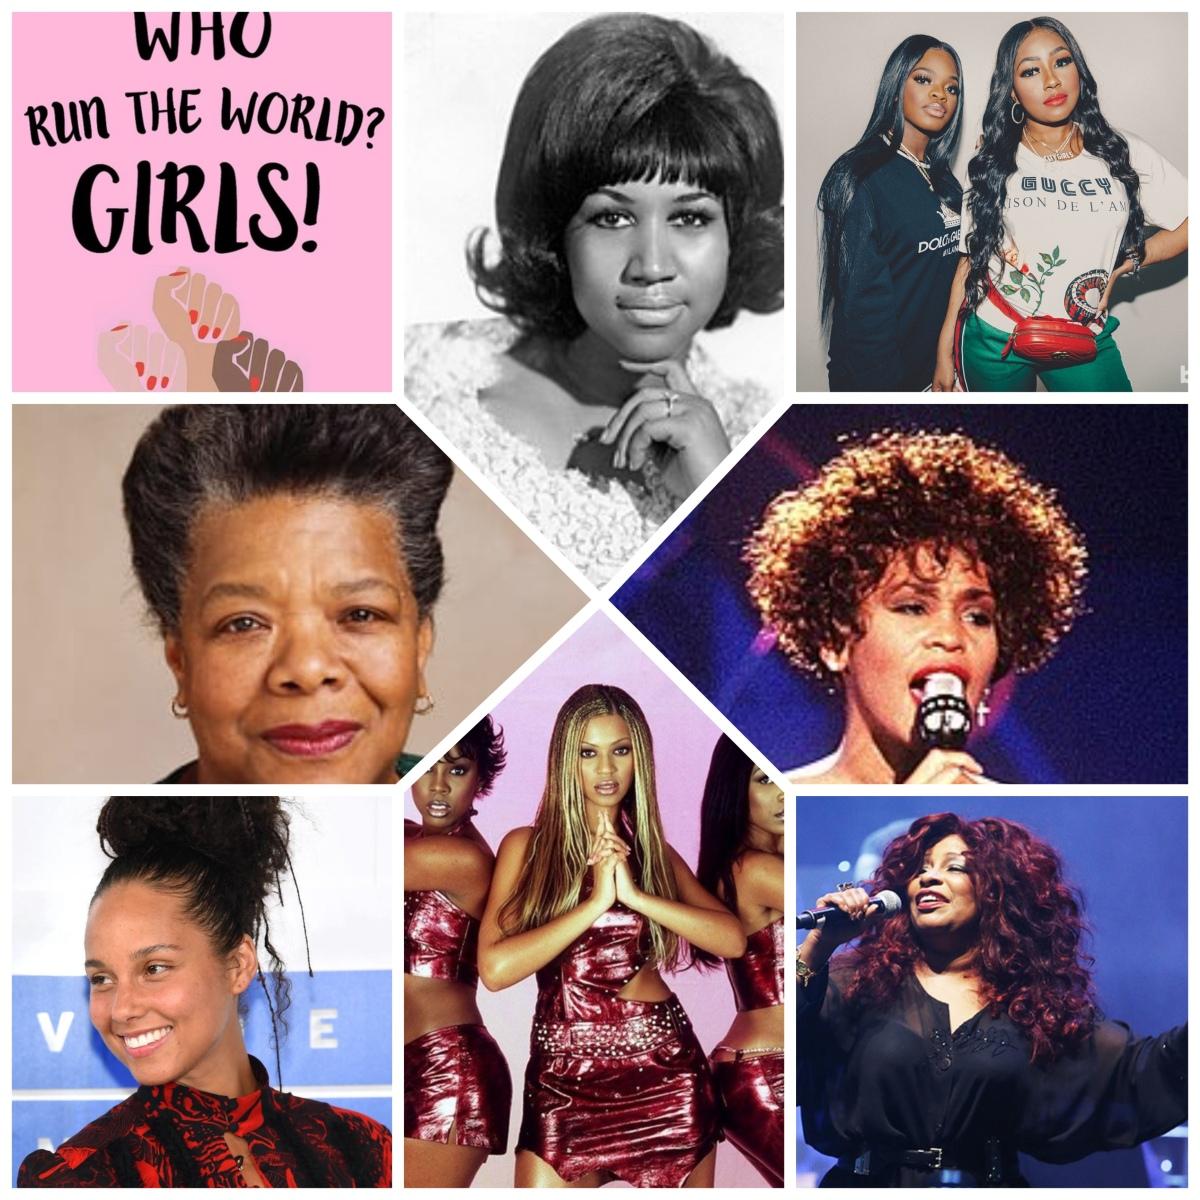 Happy International Women's Day 2019!! #BalanceForBetter